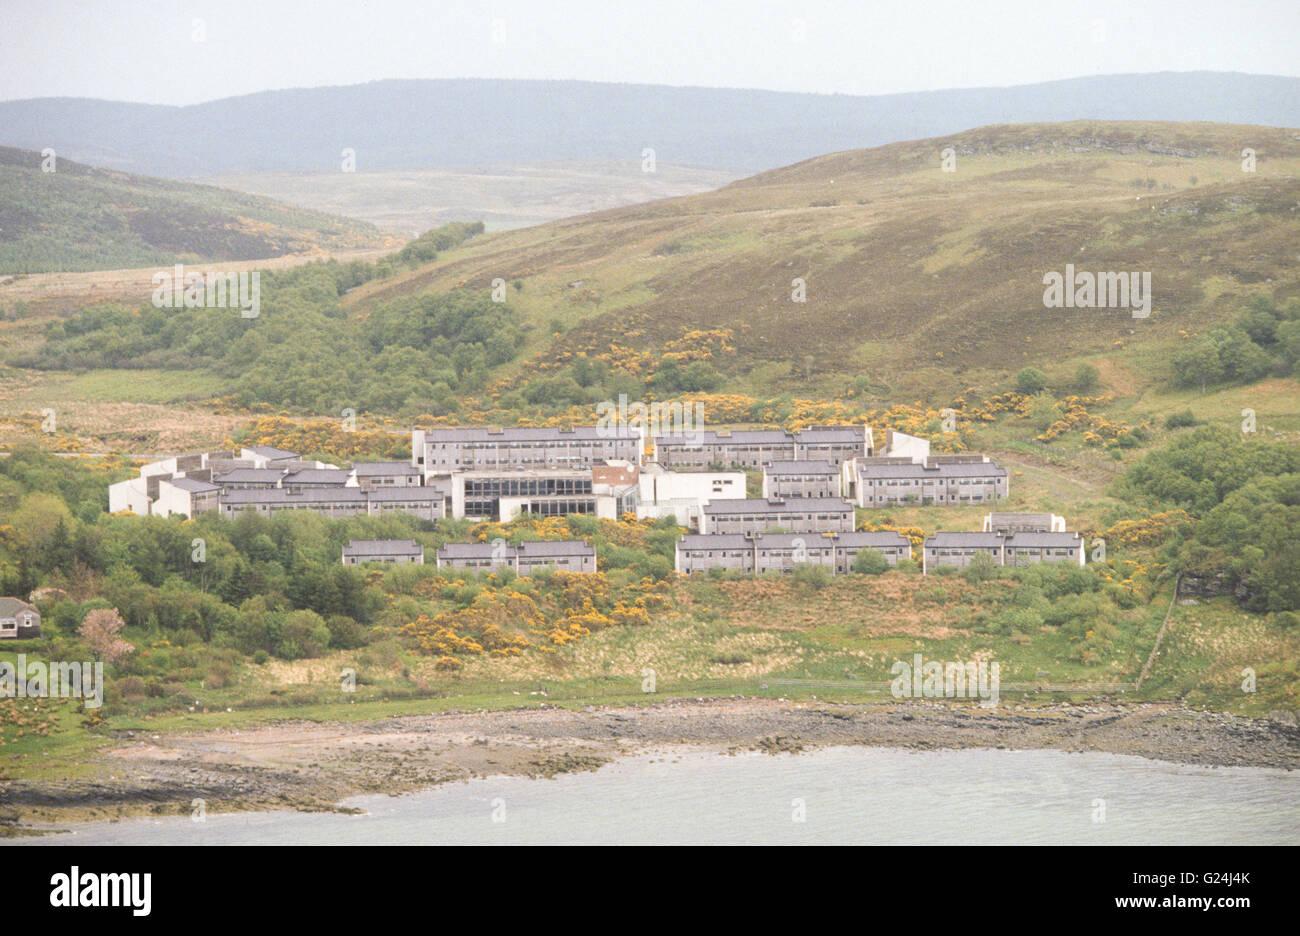 Unused construction village at Portavadie in Argyll. - Stock Image